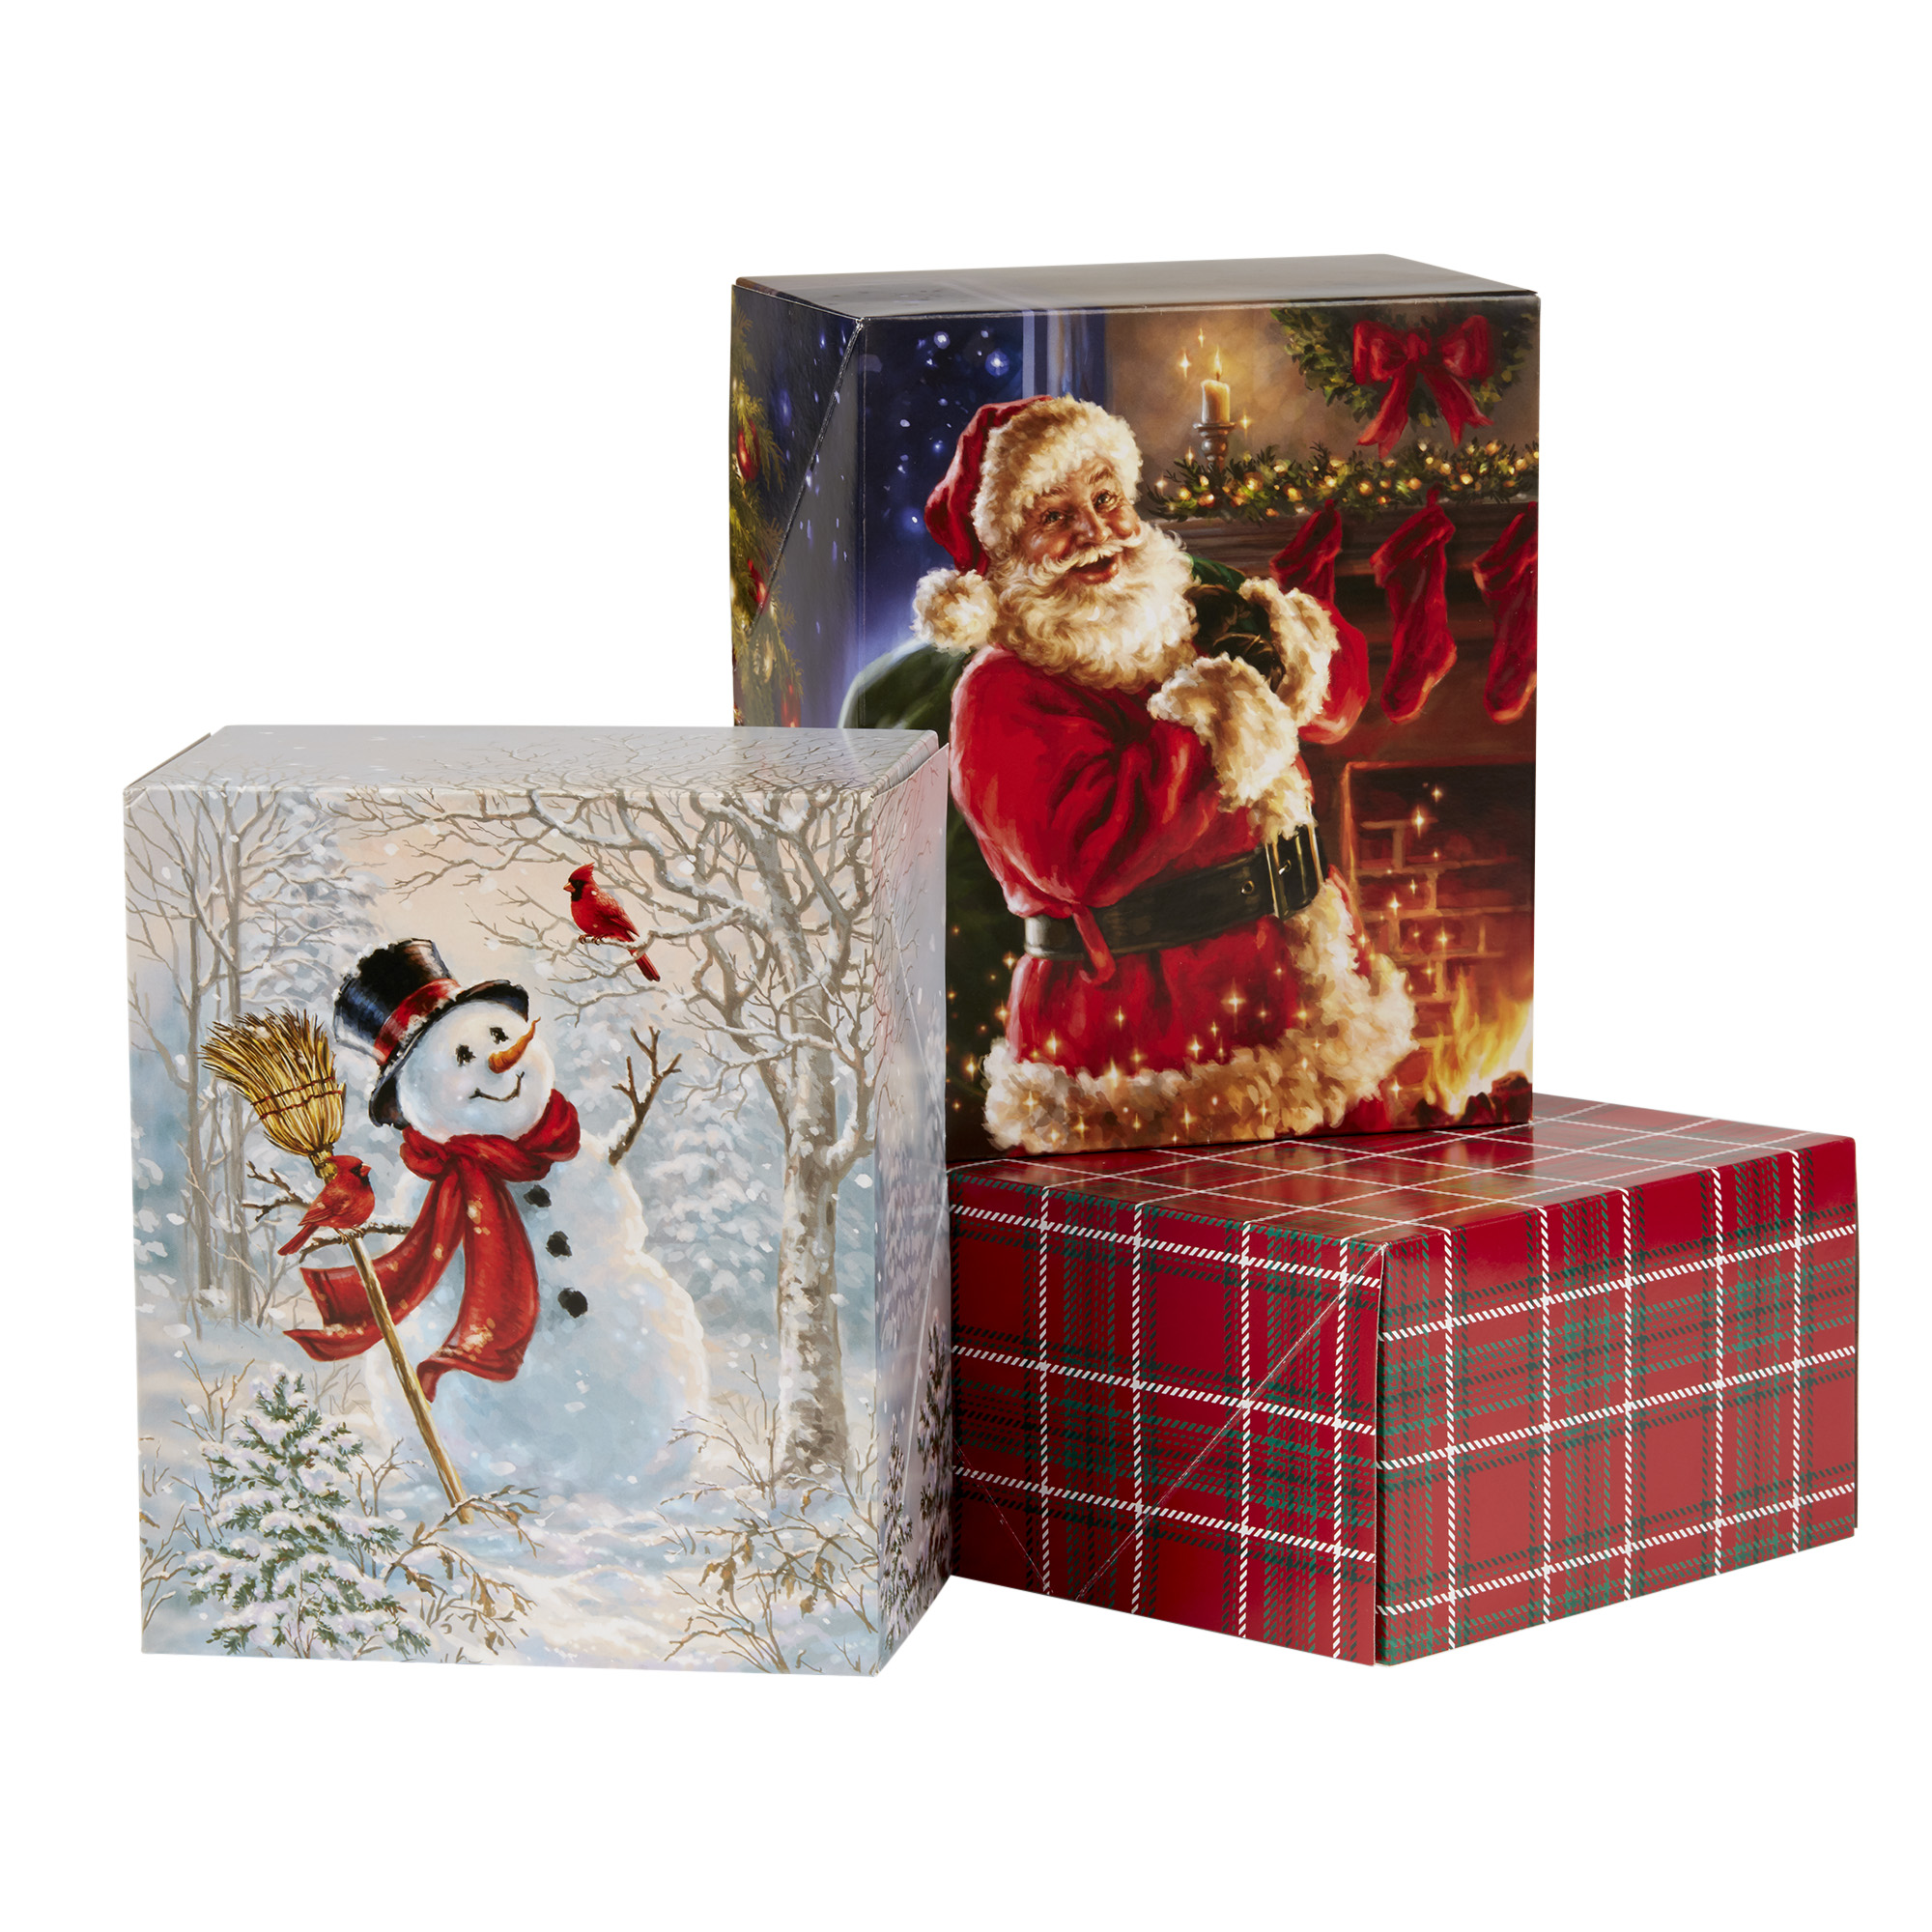 Holiday Time Decorative Gift Box Set, Christmas Theme, 3 Count